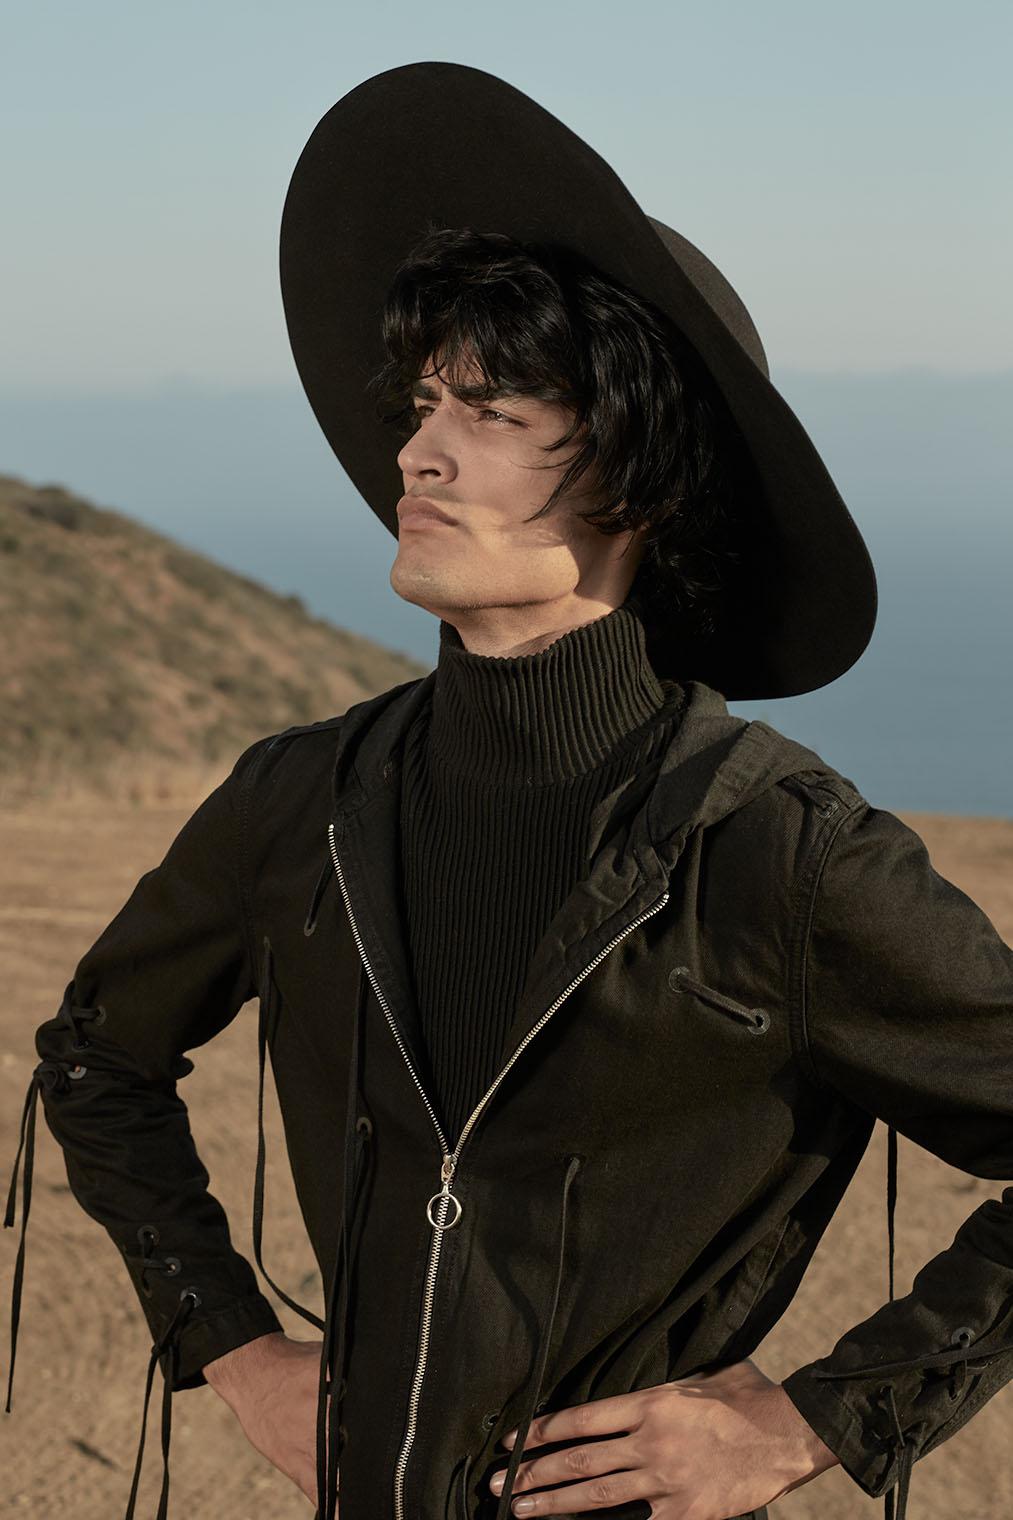 man in sombrero portrait photograph